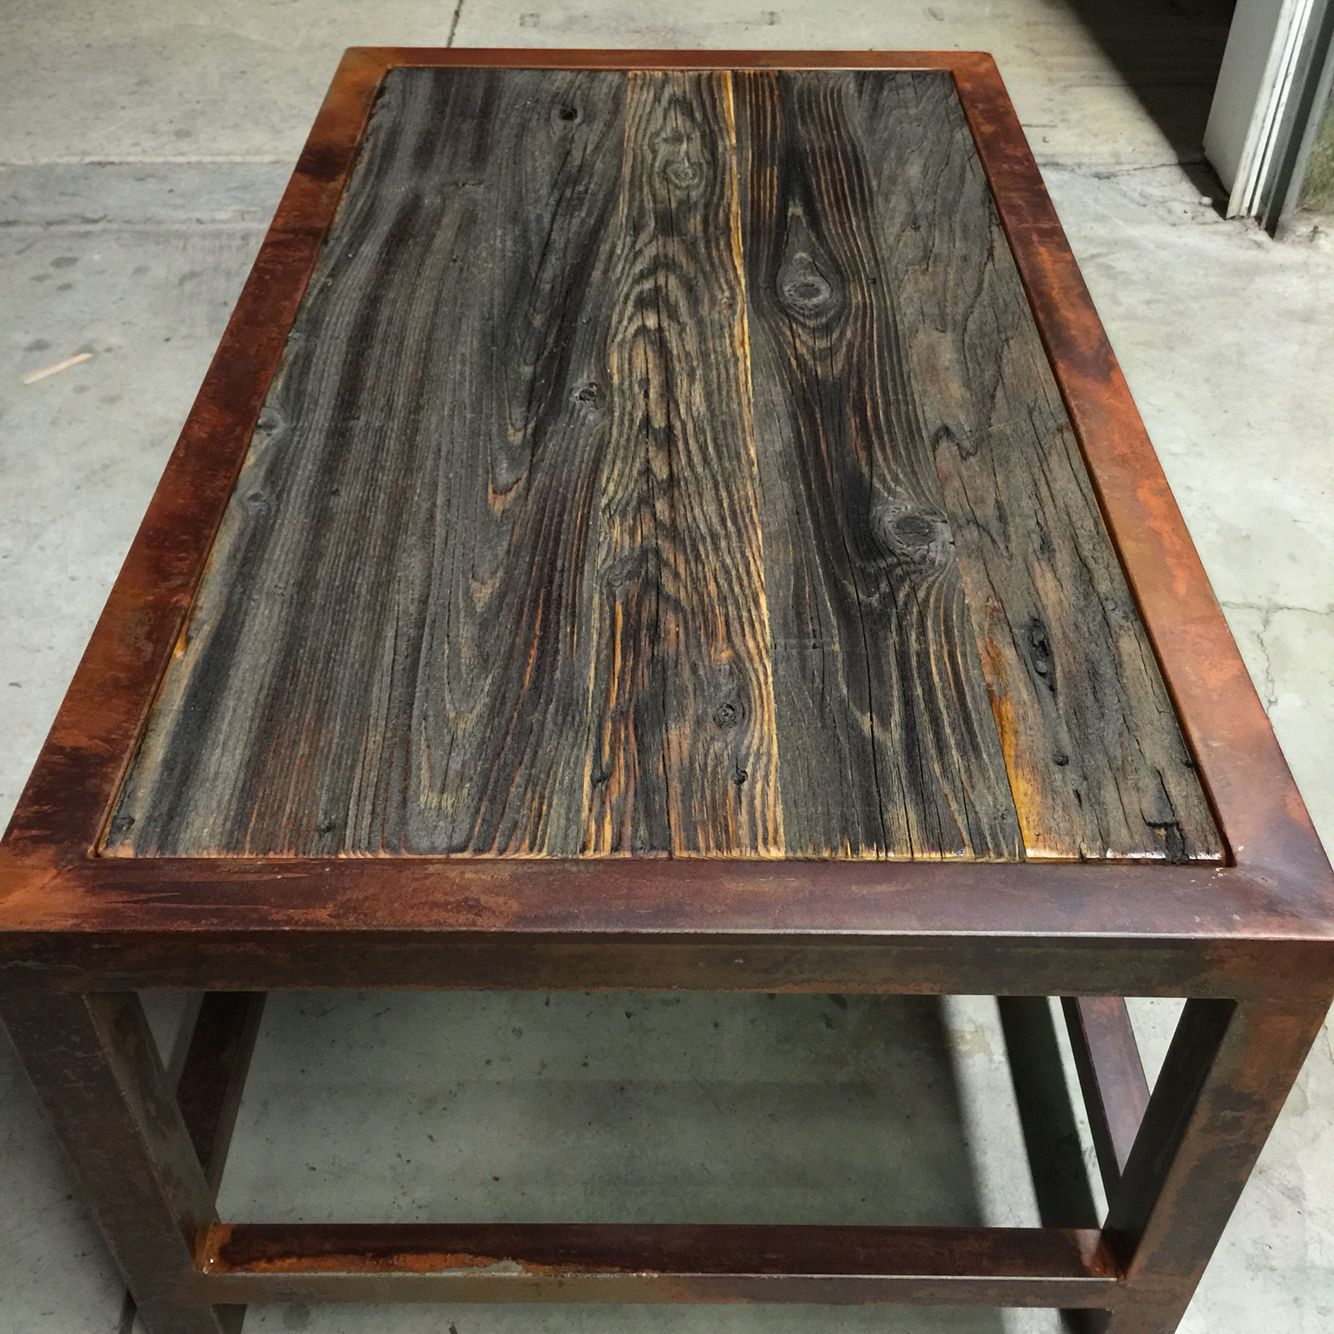 Rustic Steel And Bar Wood Coffee Table Built In Hayden Idaho By Costa Fabric Rustic Industrial Furniture Rustic Industrial Coffee Table Metal Furniture Design [ 1334 x 1334 Pixel ]